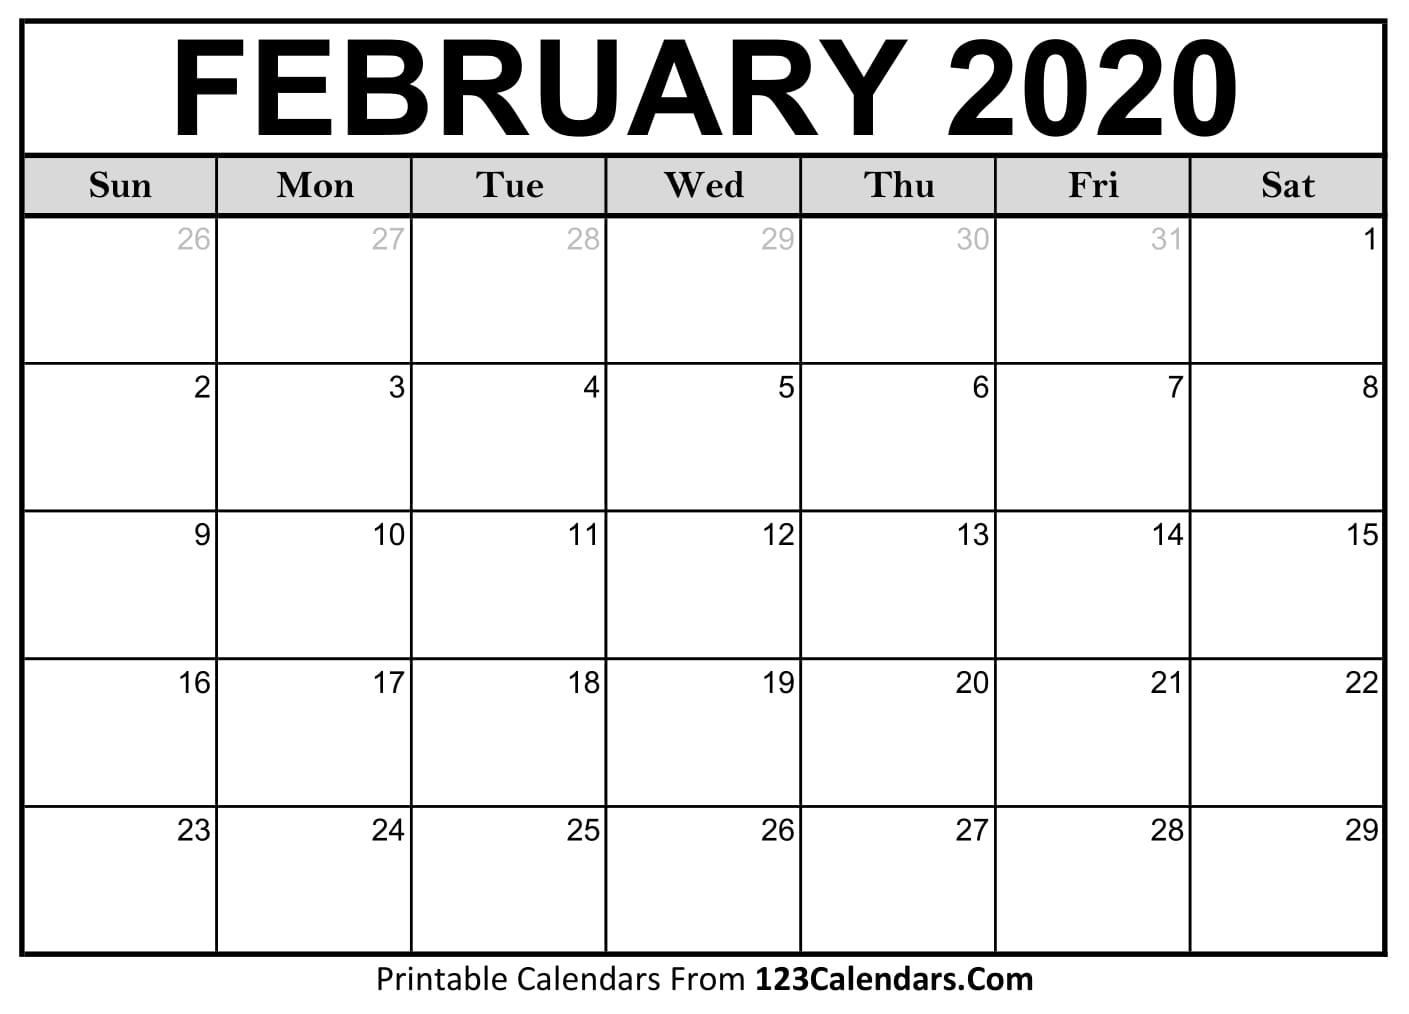 2020 Calendar February